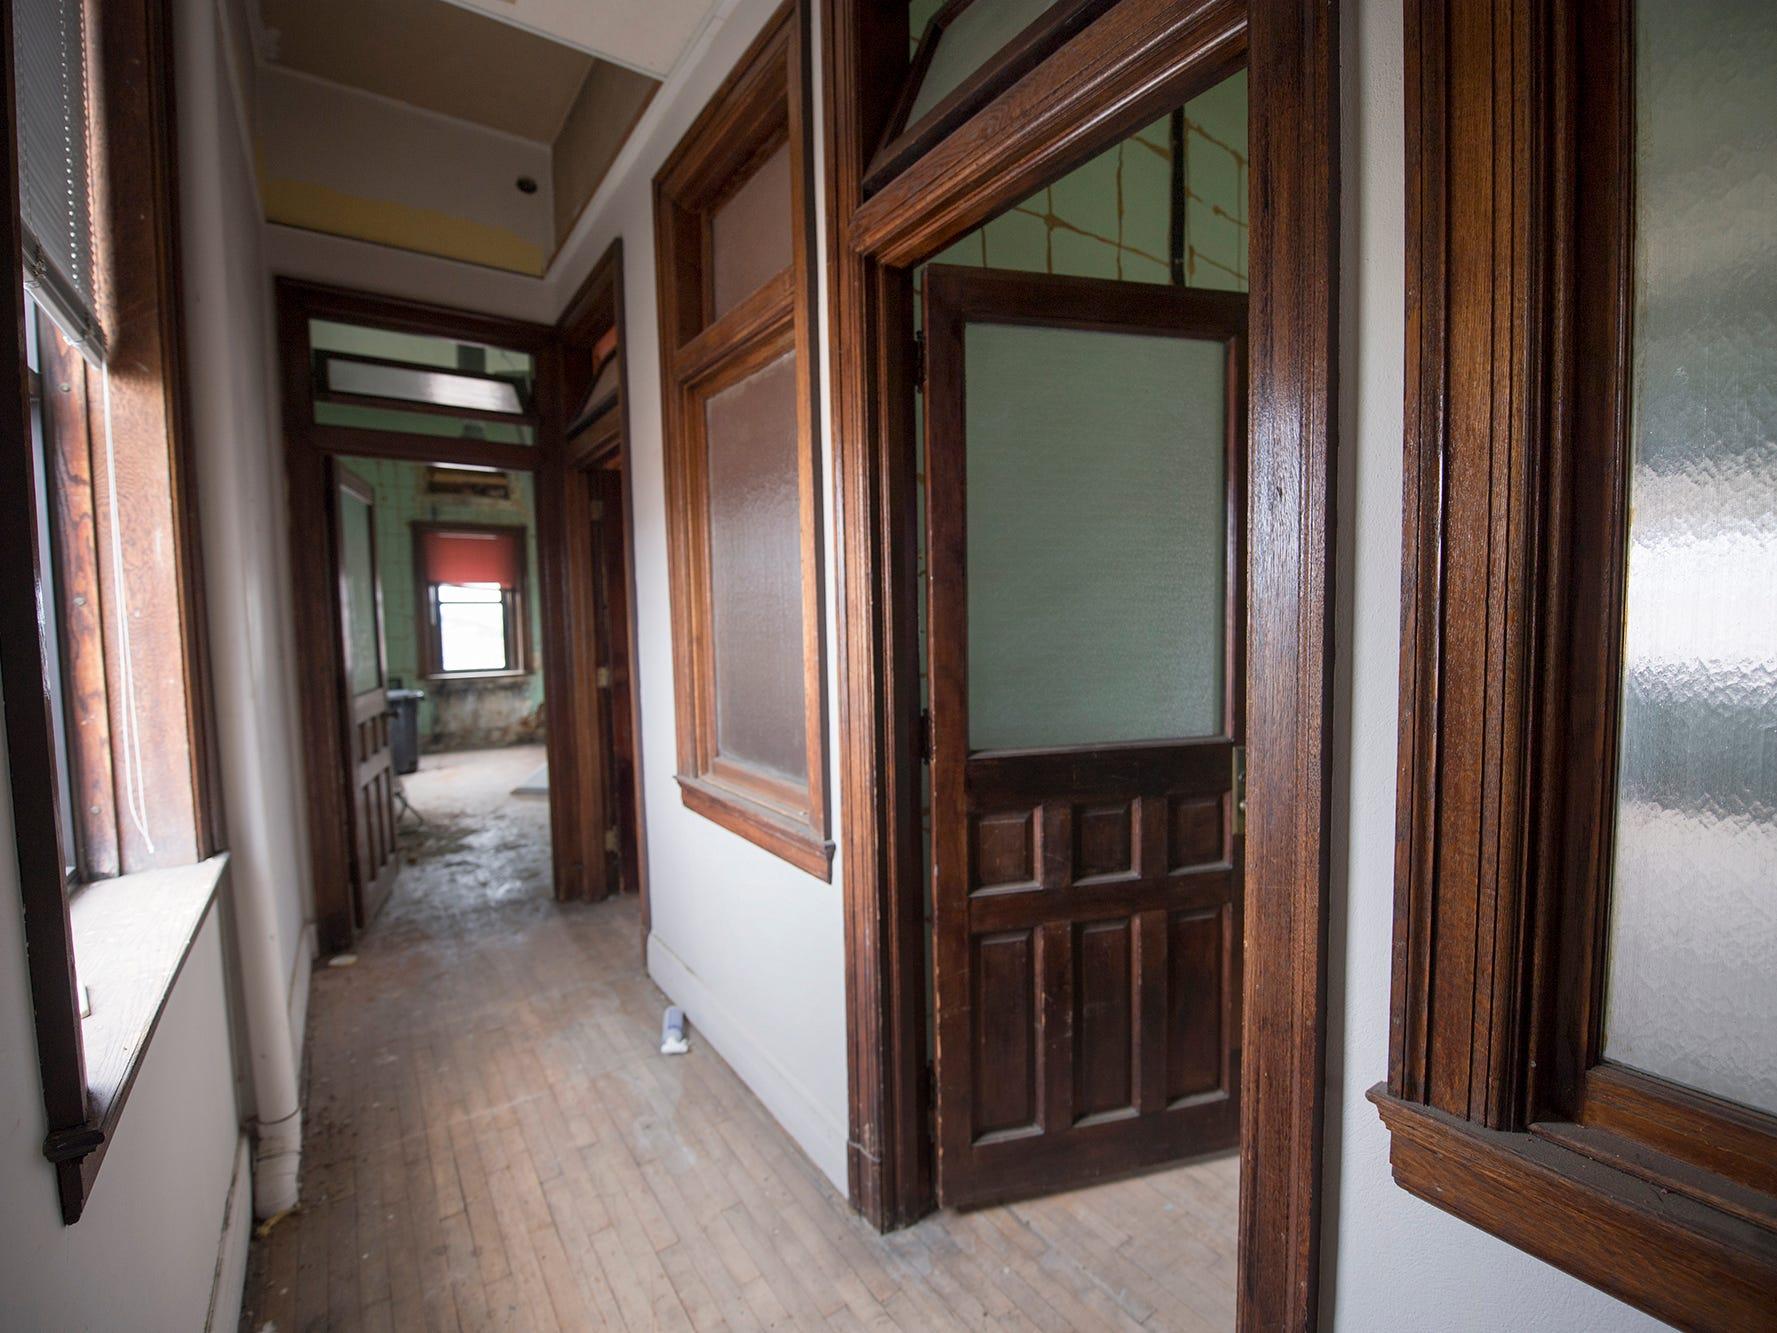 A hallway in an unused upper floor of the Rupp-Schmidt Building hasn't had a purpose in years.